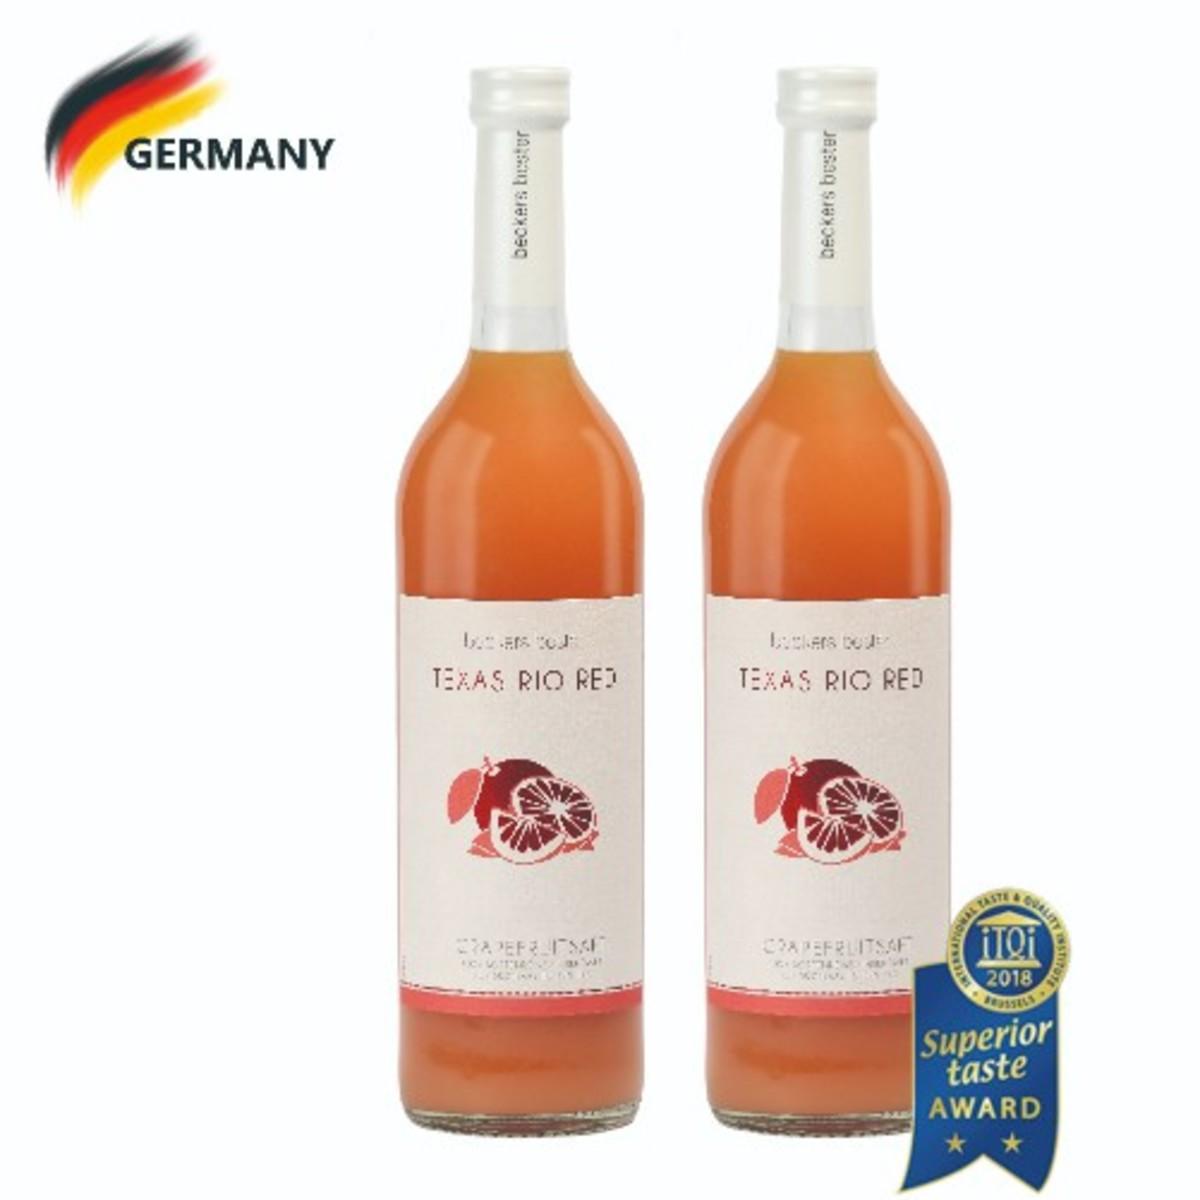 精選美國 Texas Rio Red 西柚汁 Texas Rio Red - Grapefruit Juice 700ml x2